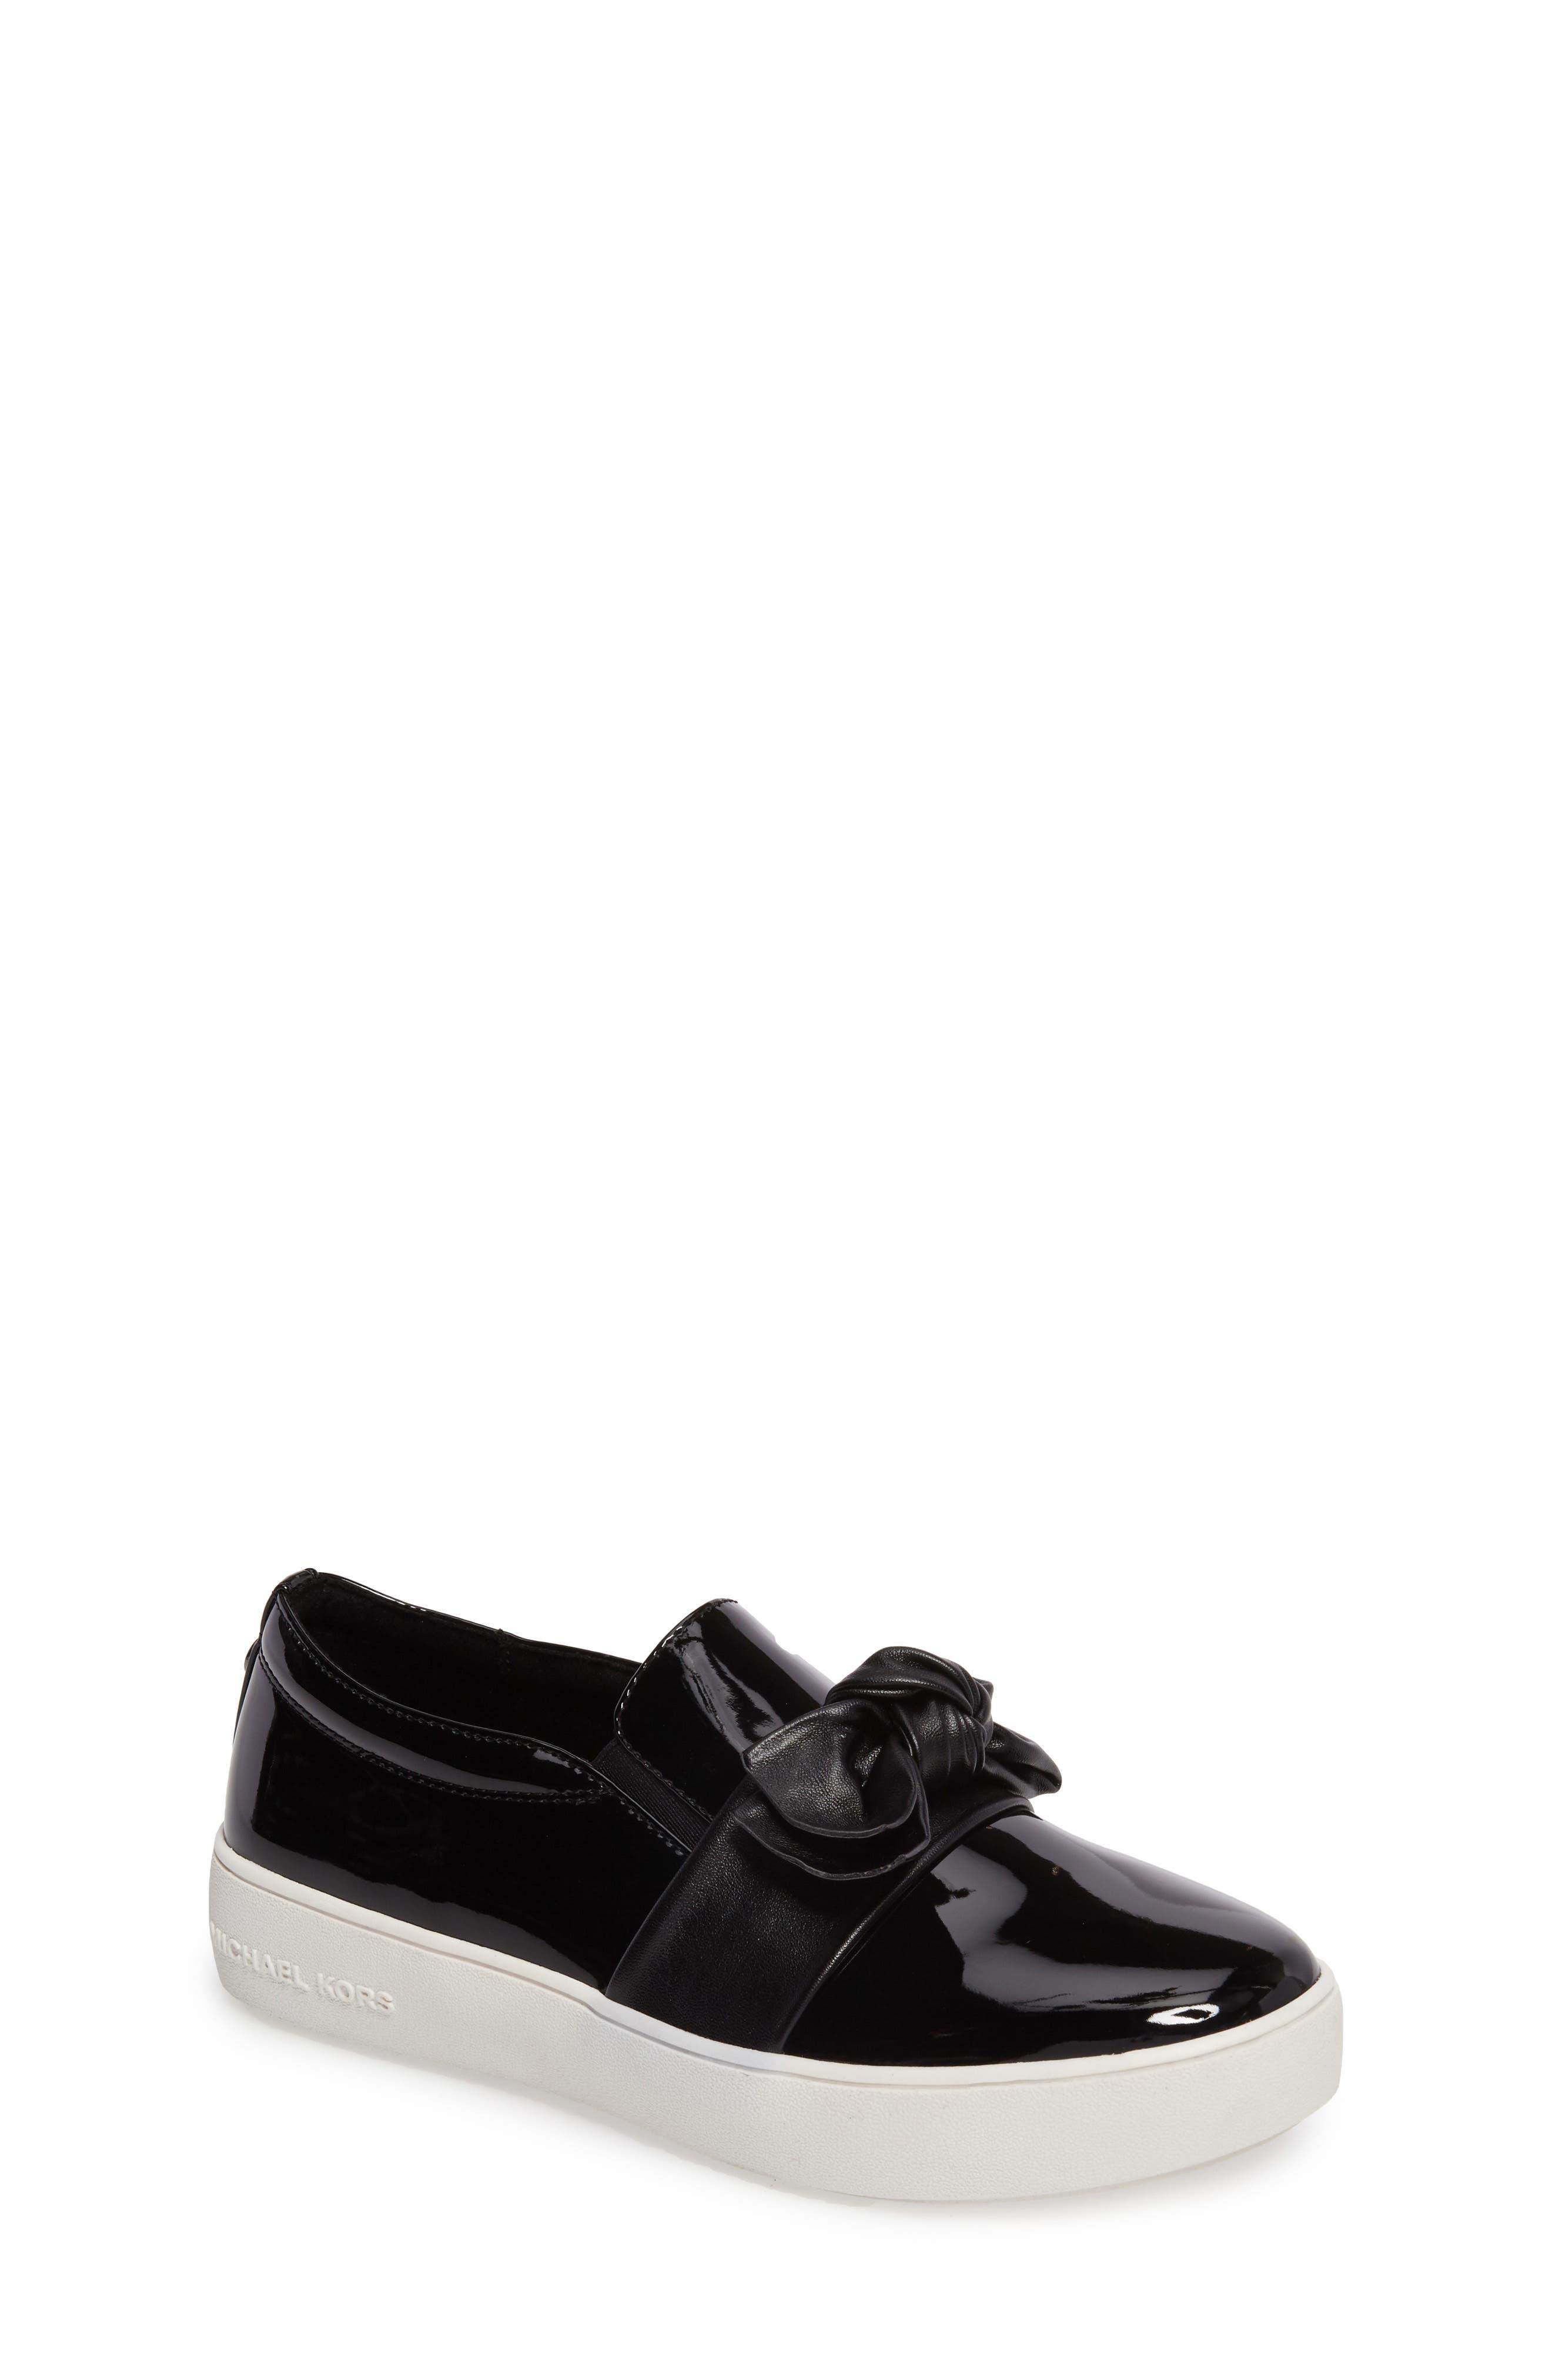 Maven Poppy Knotted Slip-On Sneaker,                             Main thumbnail 1, color,